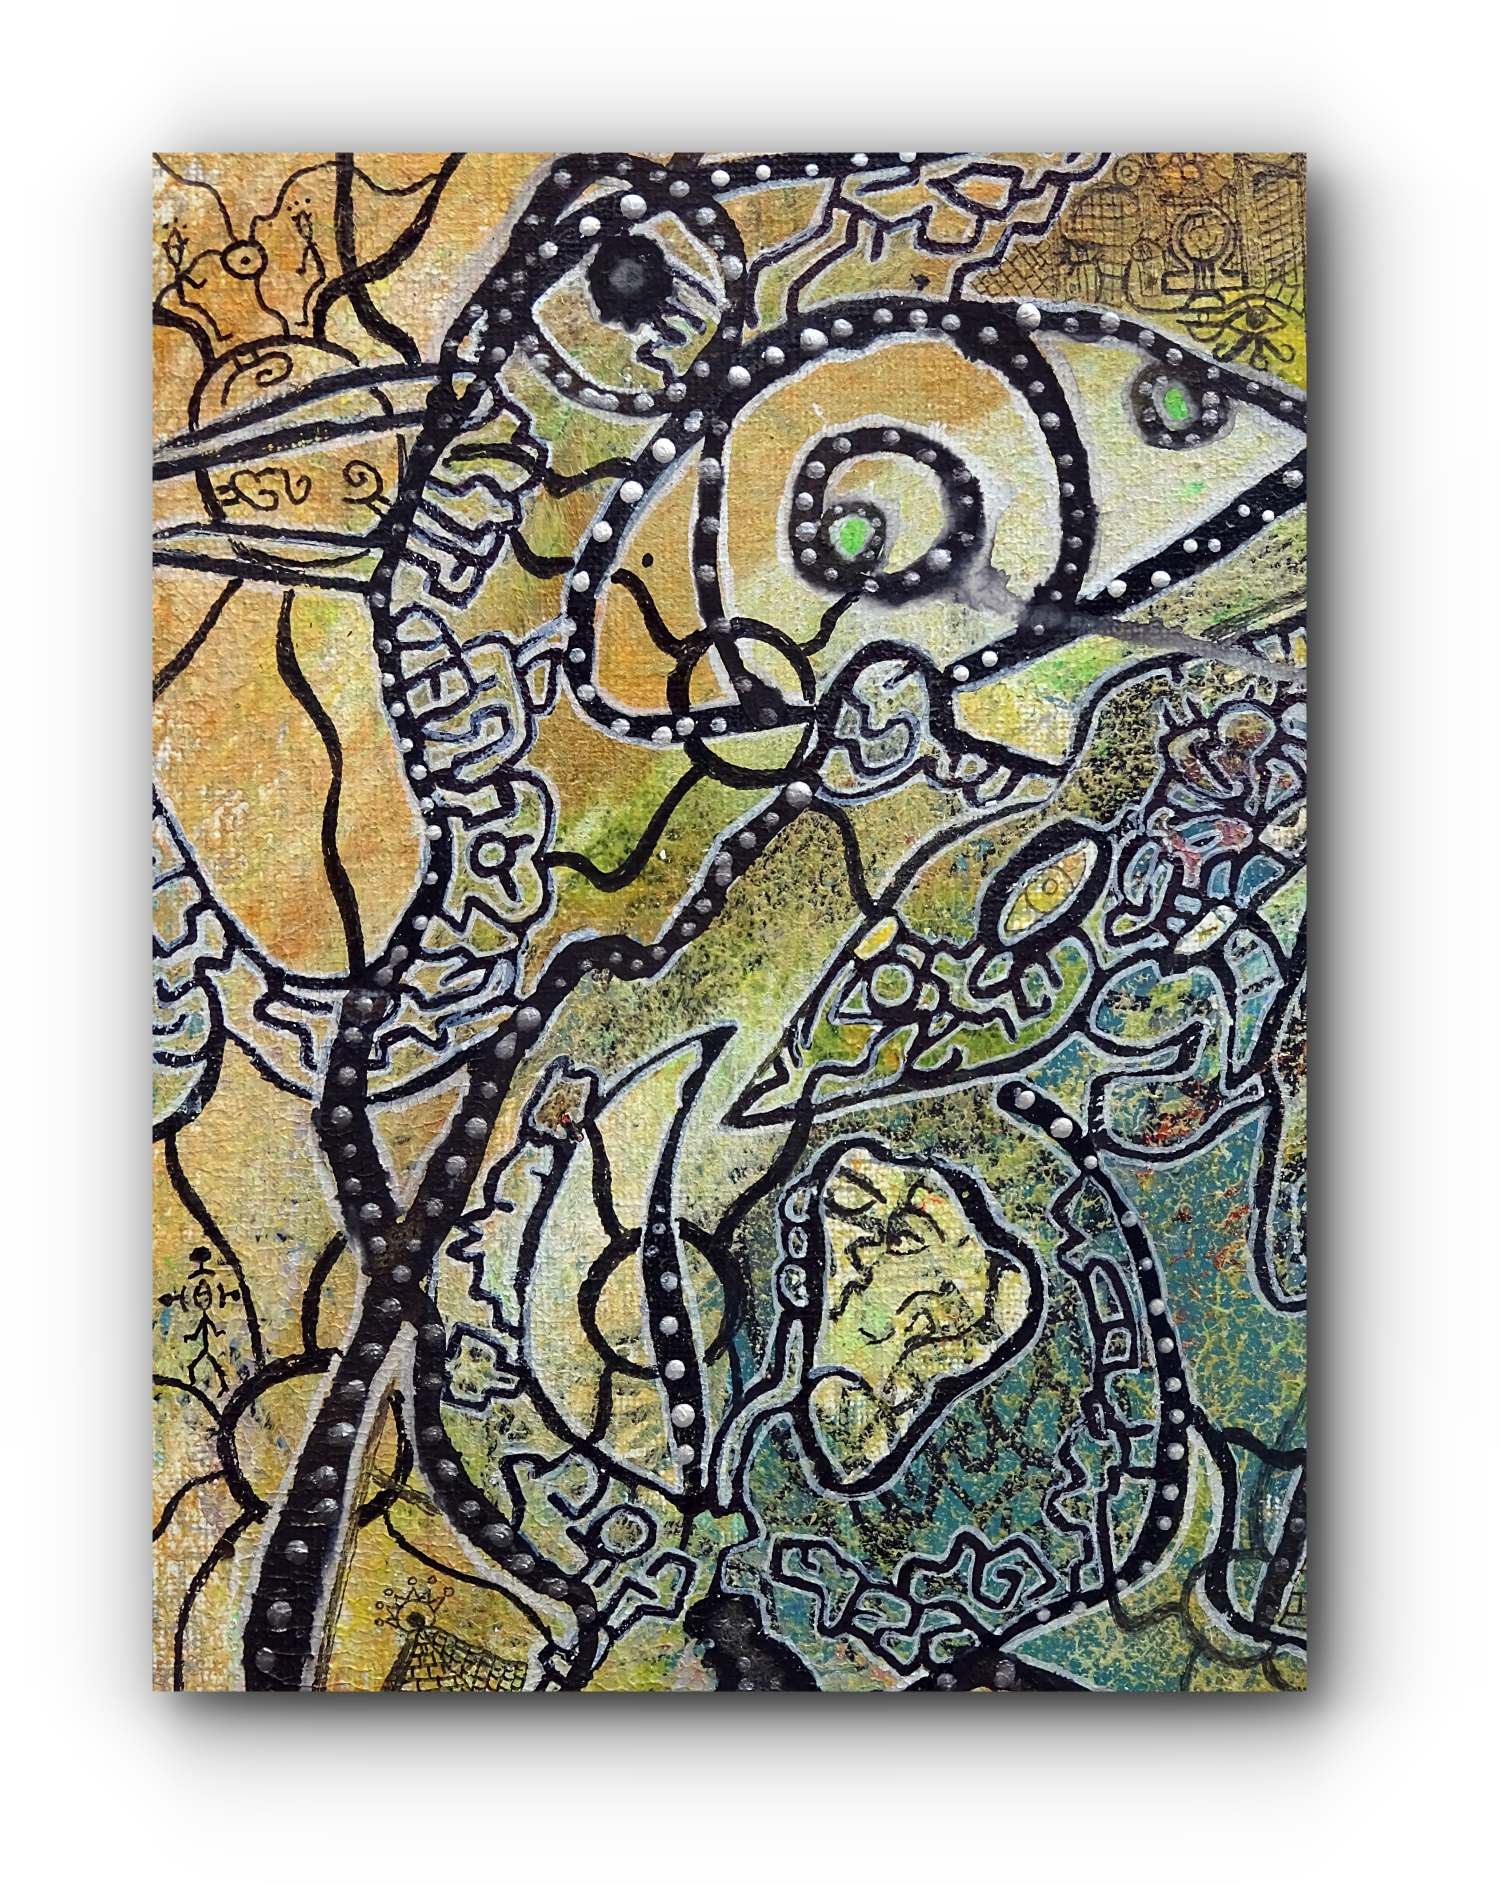 painting-detail-11-desert-dwellers-artists-ingress-vortices.jpg